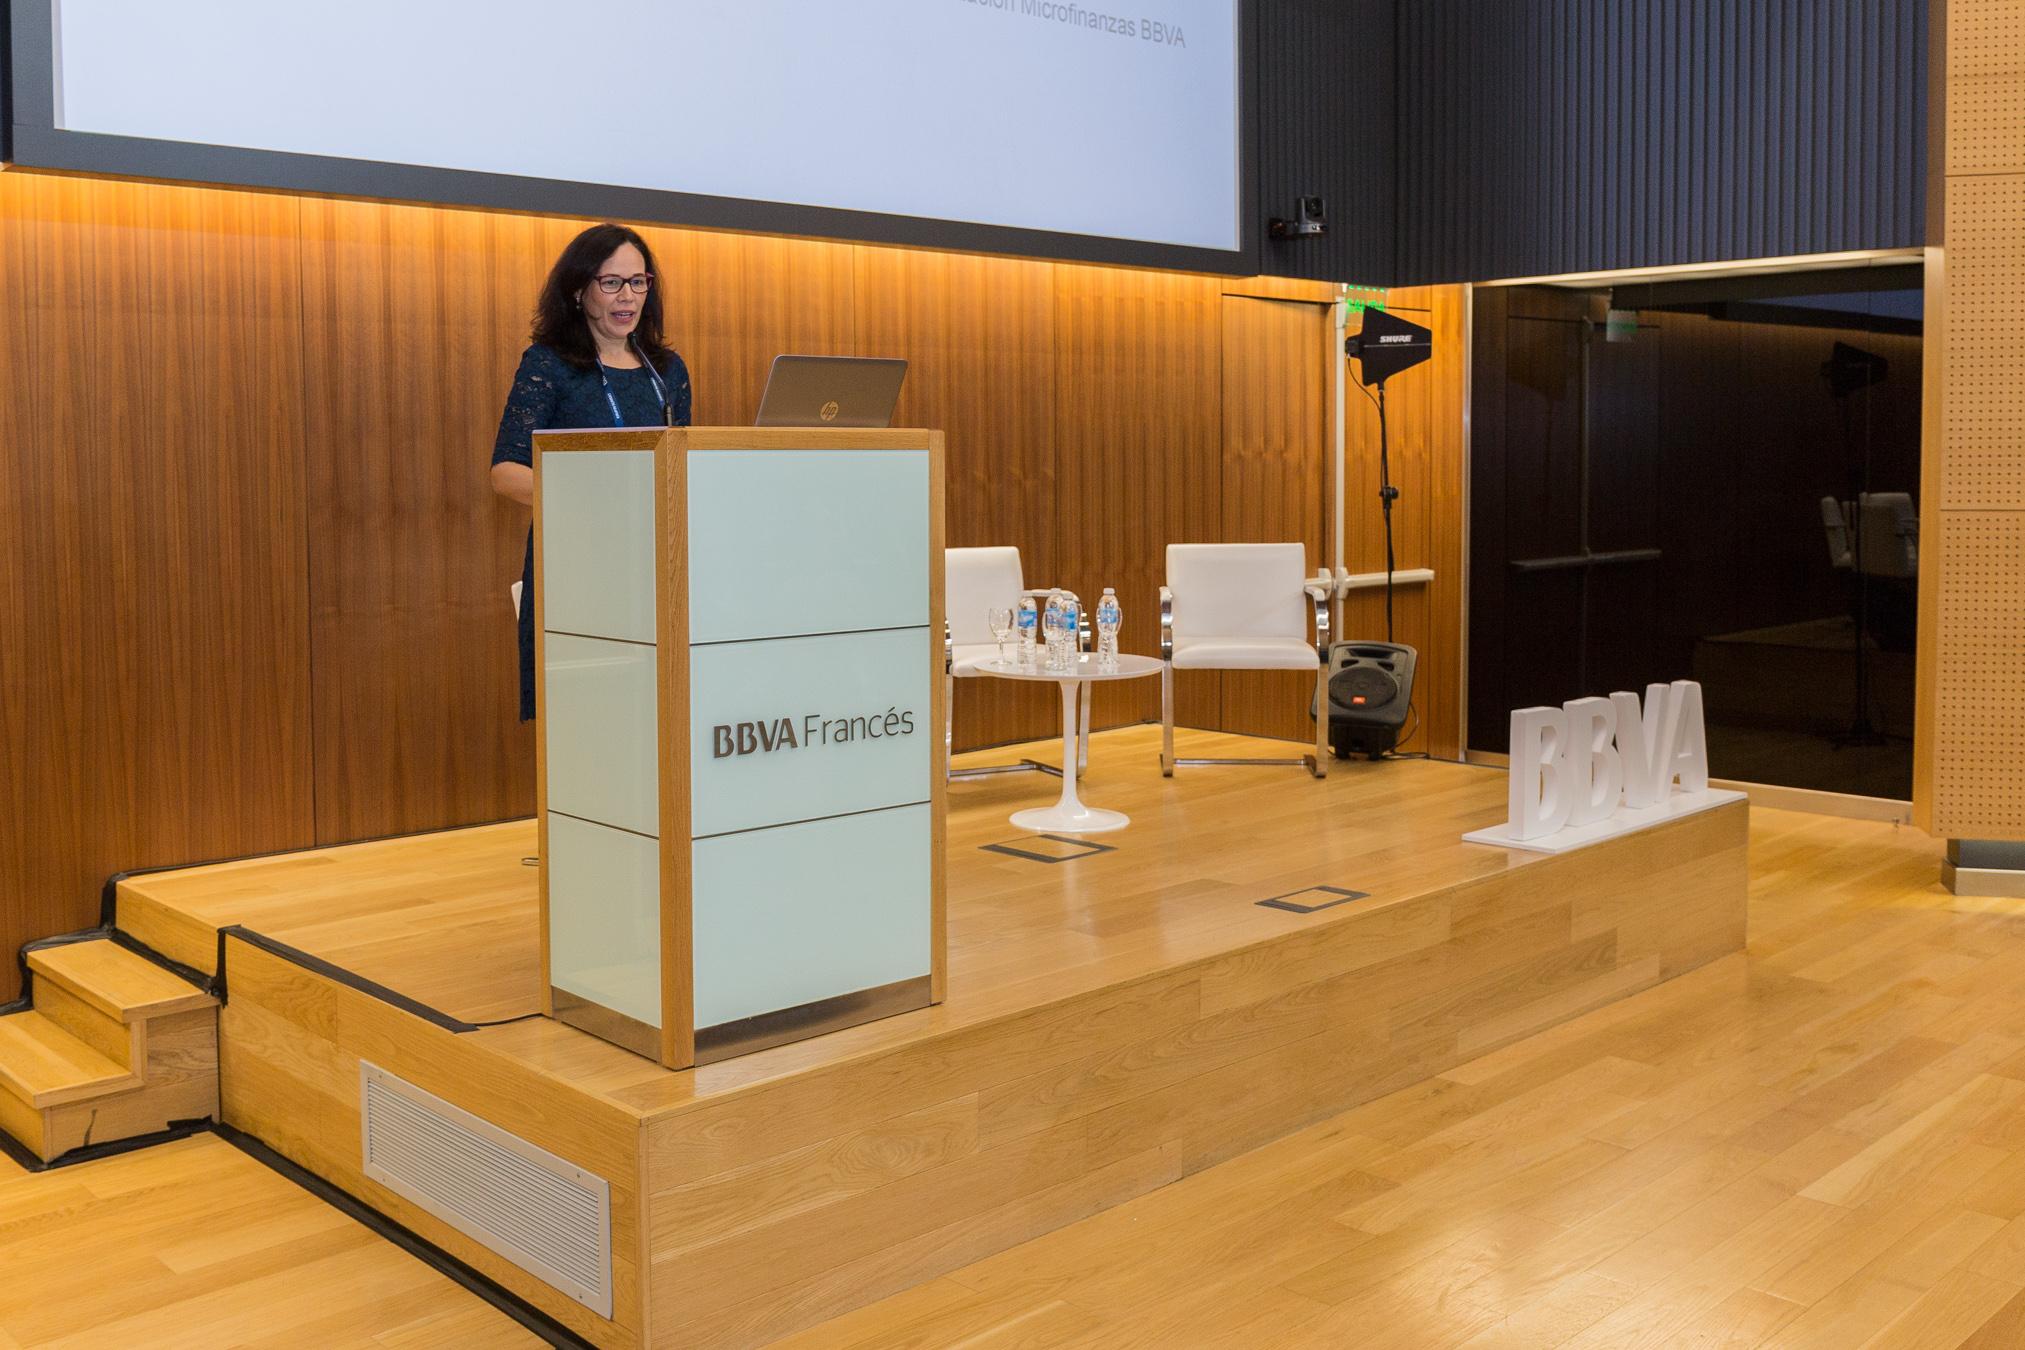 Lidia del Pozo, Director, Community Investment Programs at BBVA